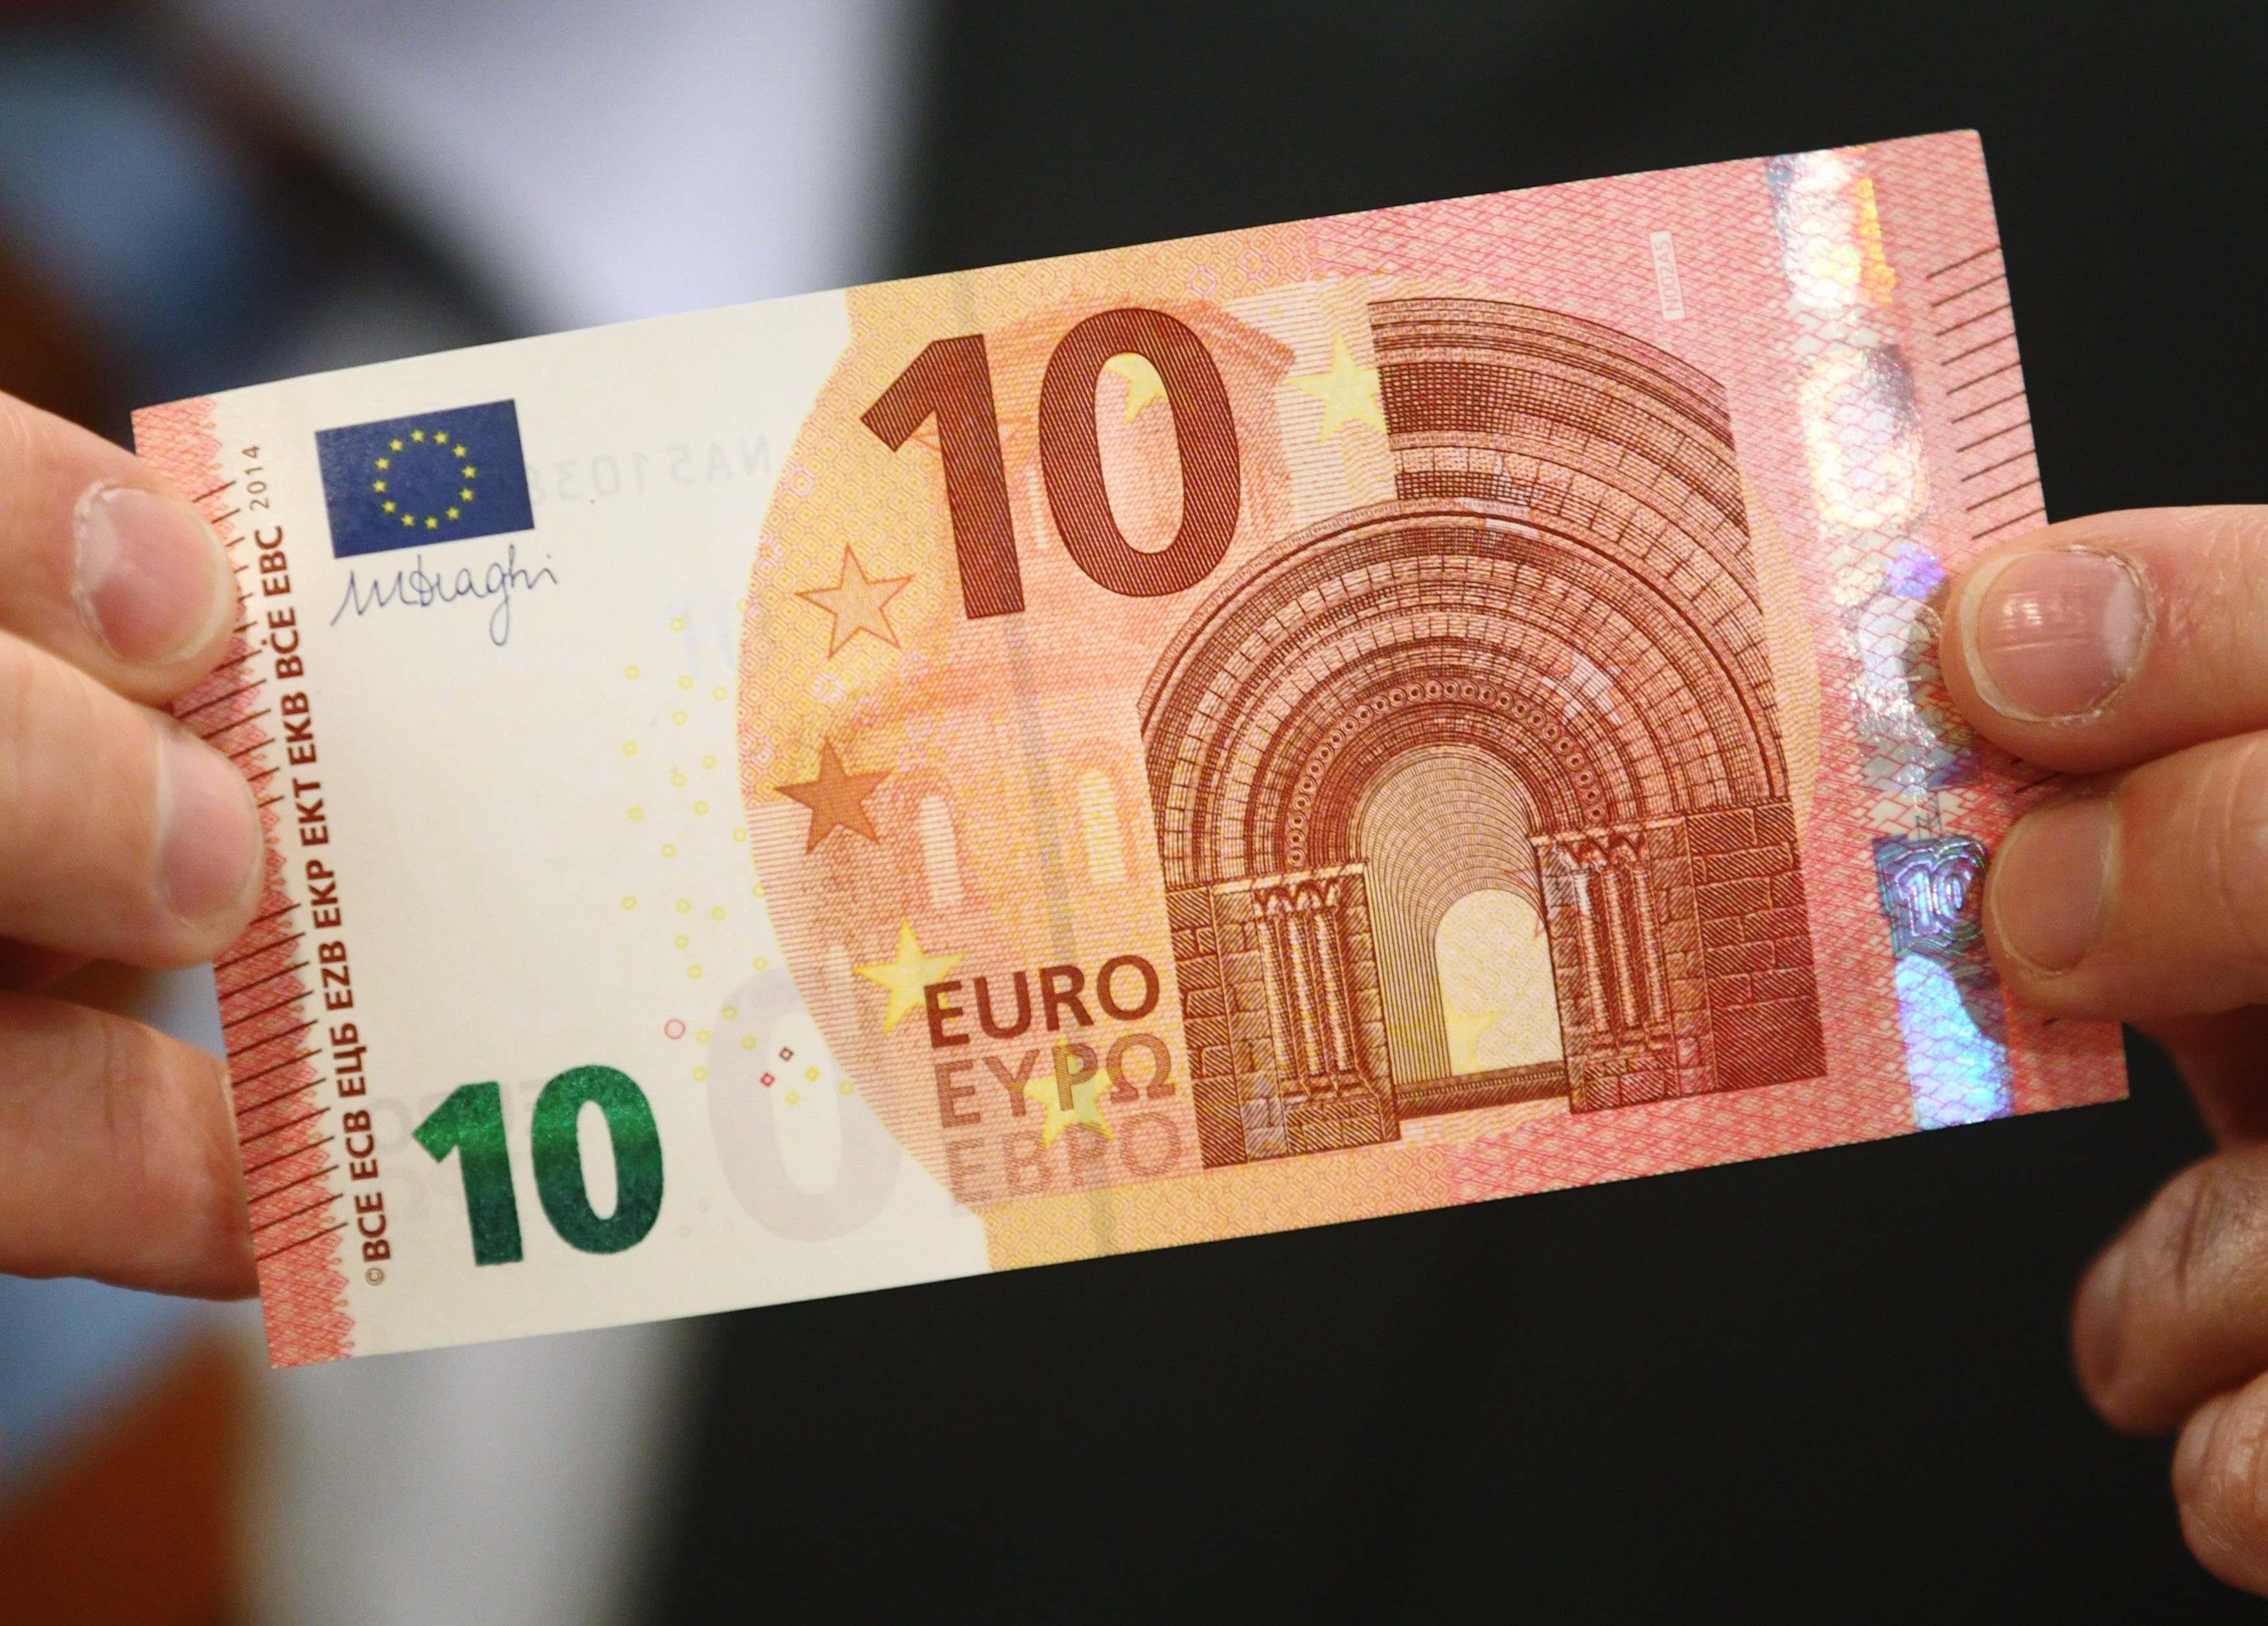 НБУ ощутимо повысил курс гривни к евро